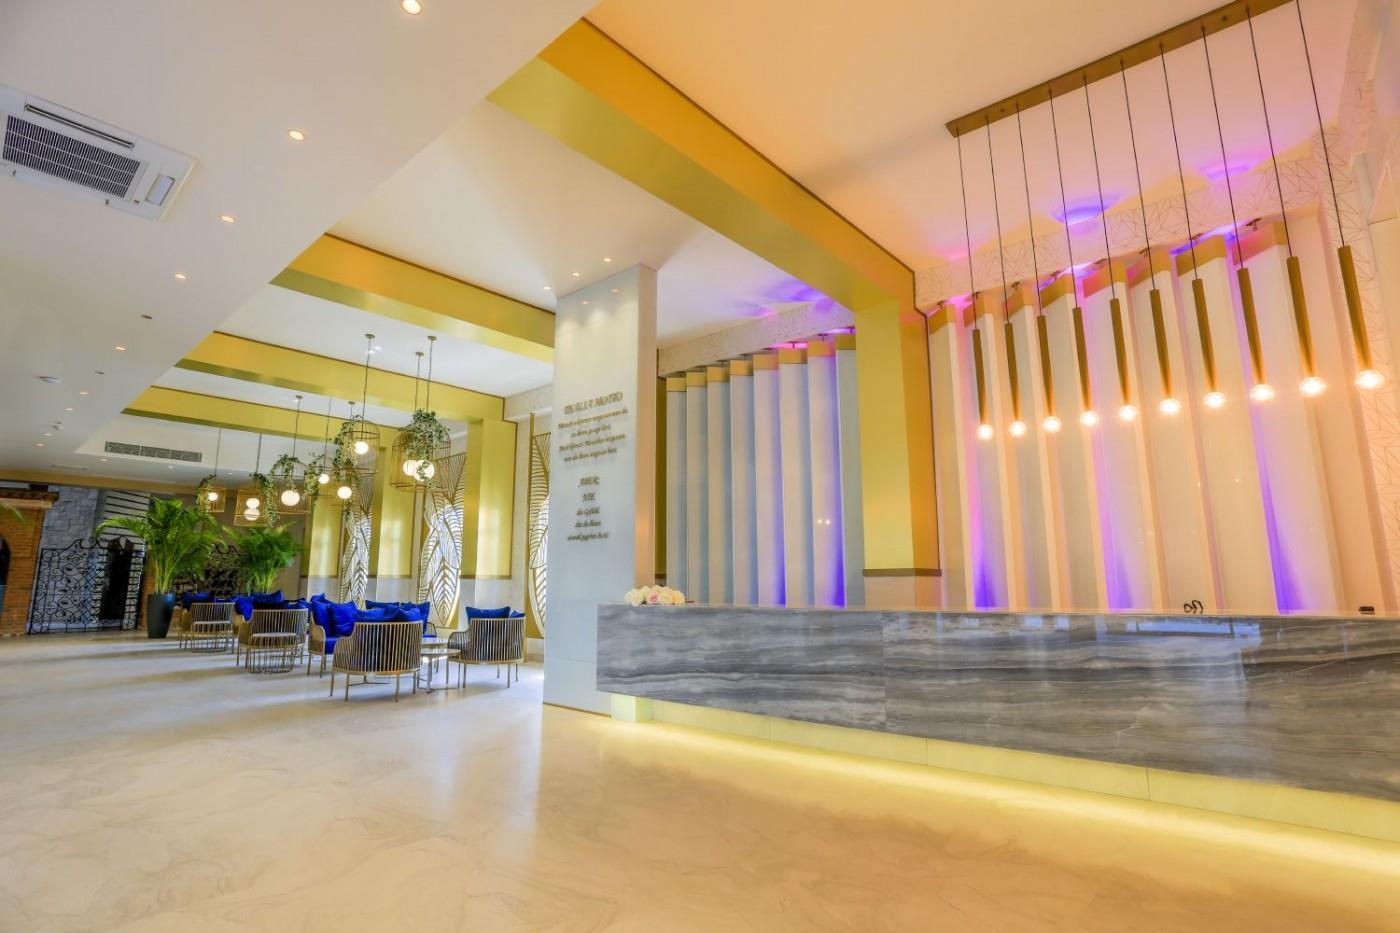 http://www.orextravel.sk/OREX/hotelphotos/thalia-unique-area-0021.jpg